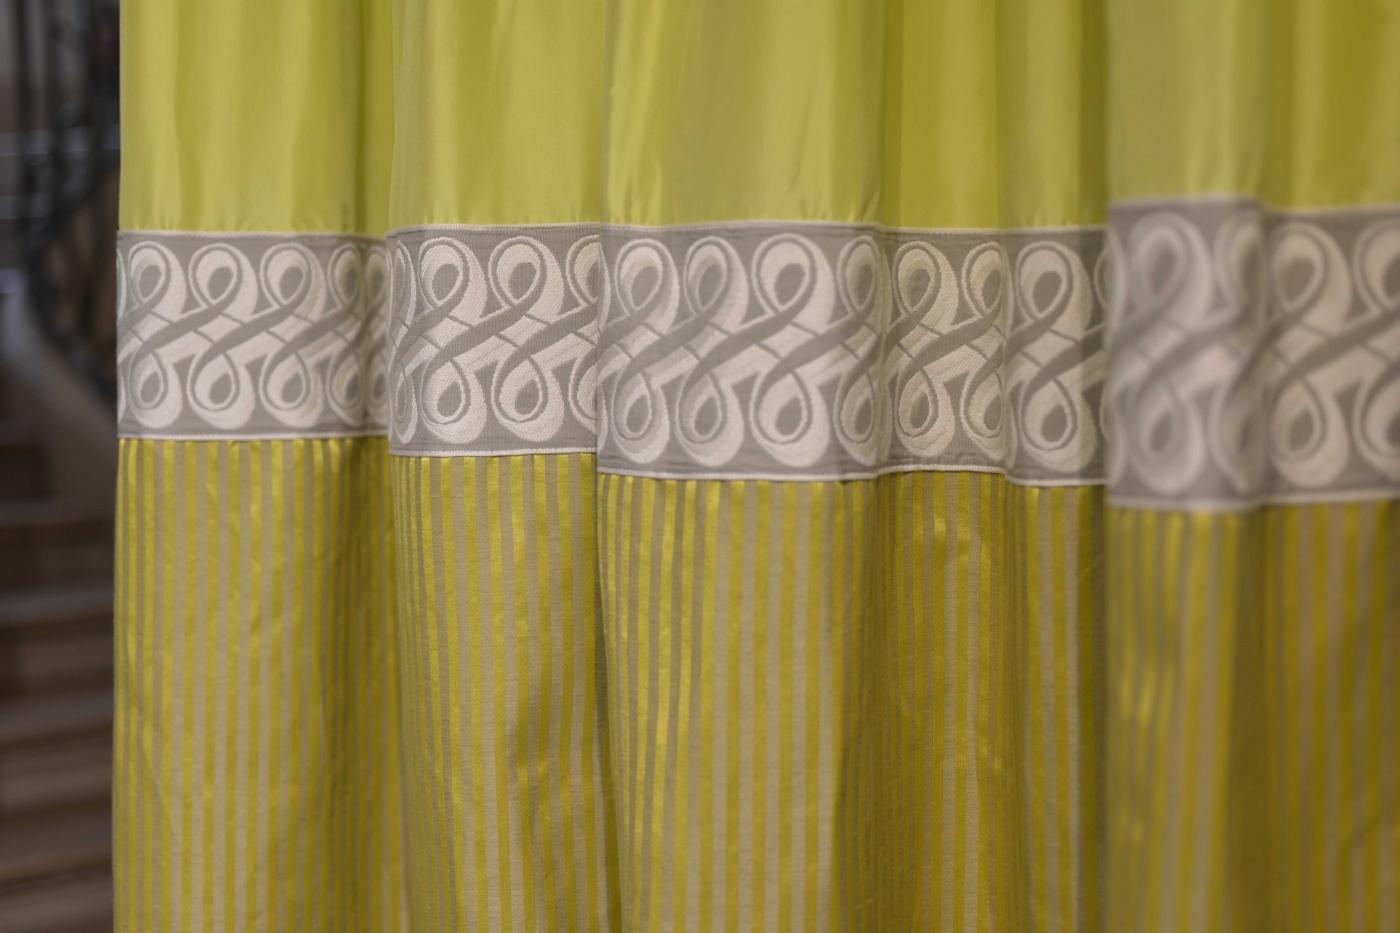 tissu d 39 ameublement giulia de houl s r f rence 72788. Black Bedroom Furniture Sets. Home Design Ideas